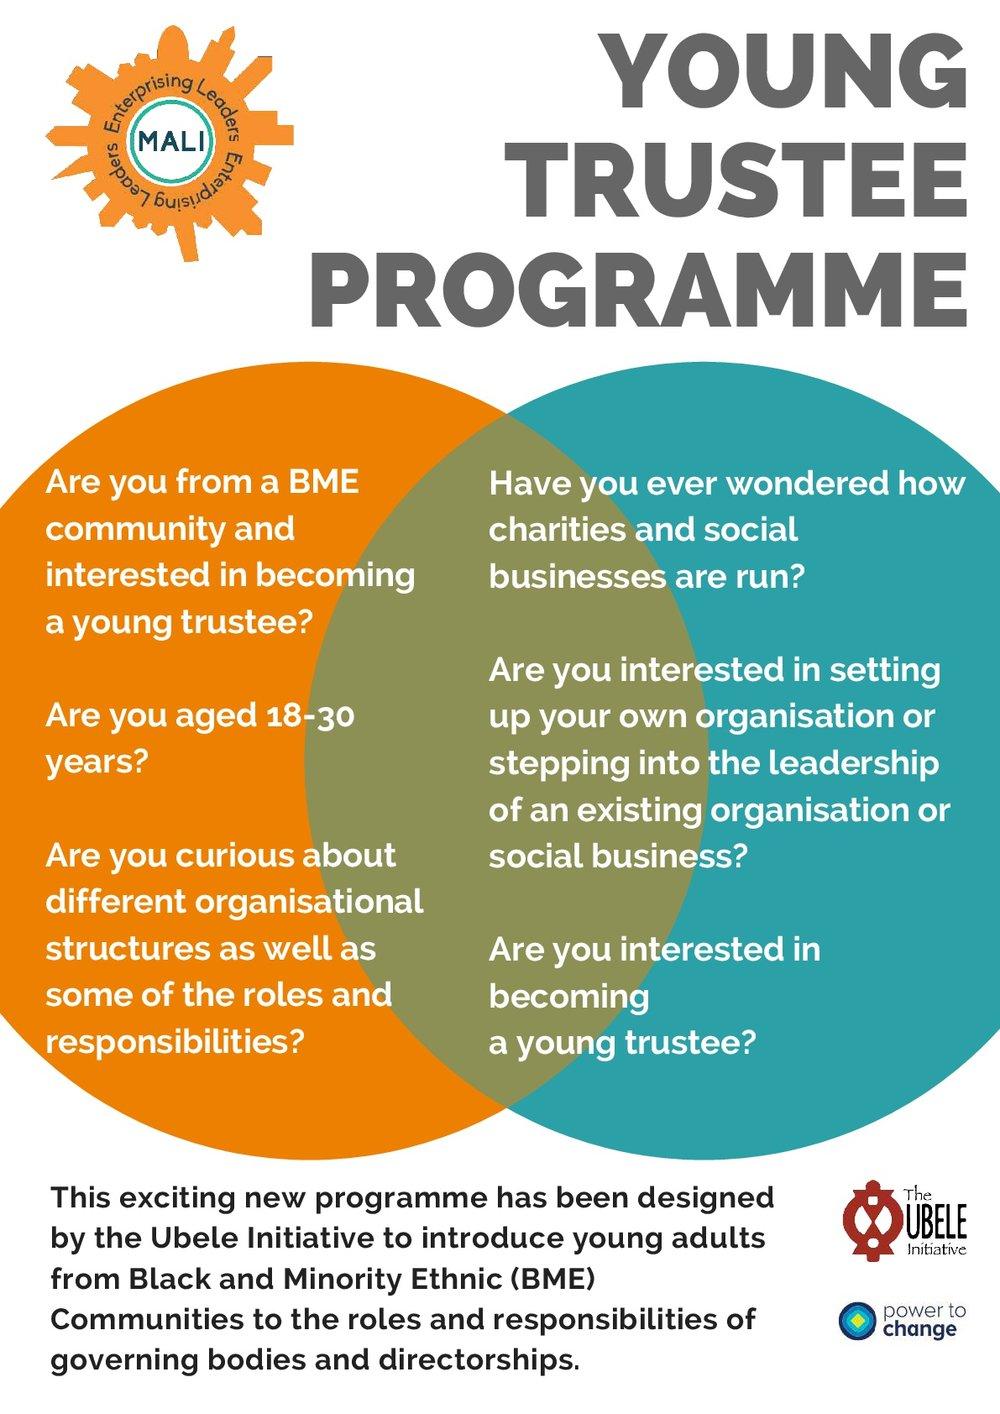 Young-Trustee-Programme-flyer-001.jpg